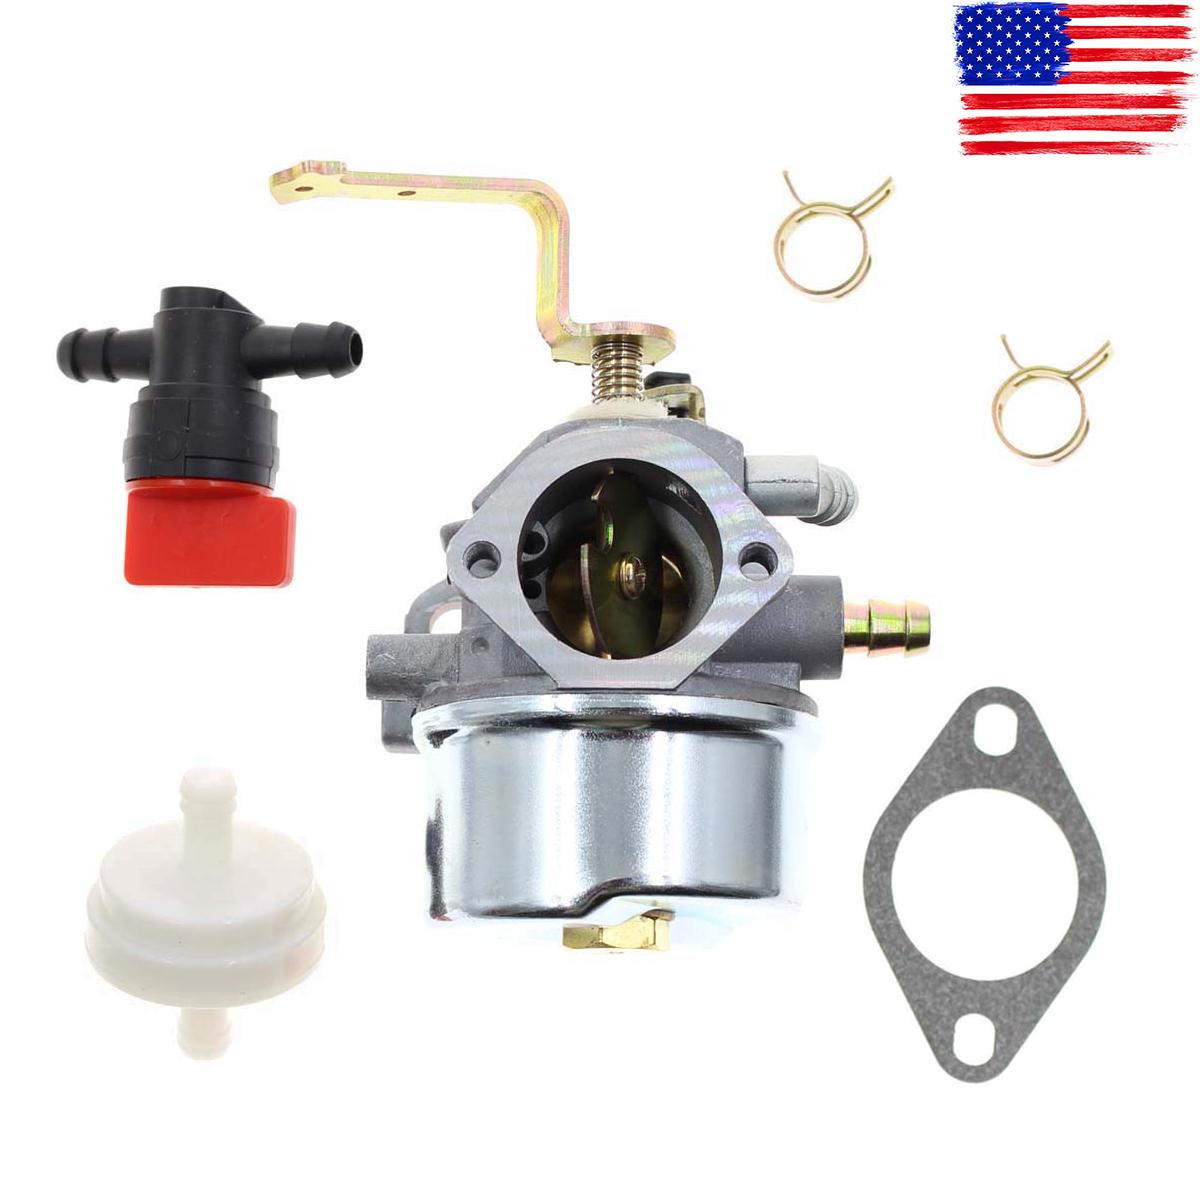 hight resolution of carburetor fuel filter for stens 520 956 056 320 rotary 13155 tecumseh 640260